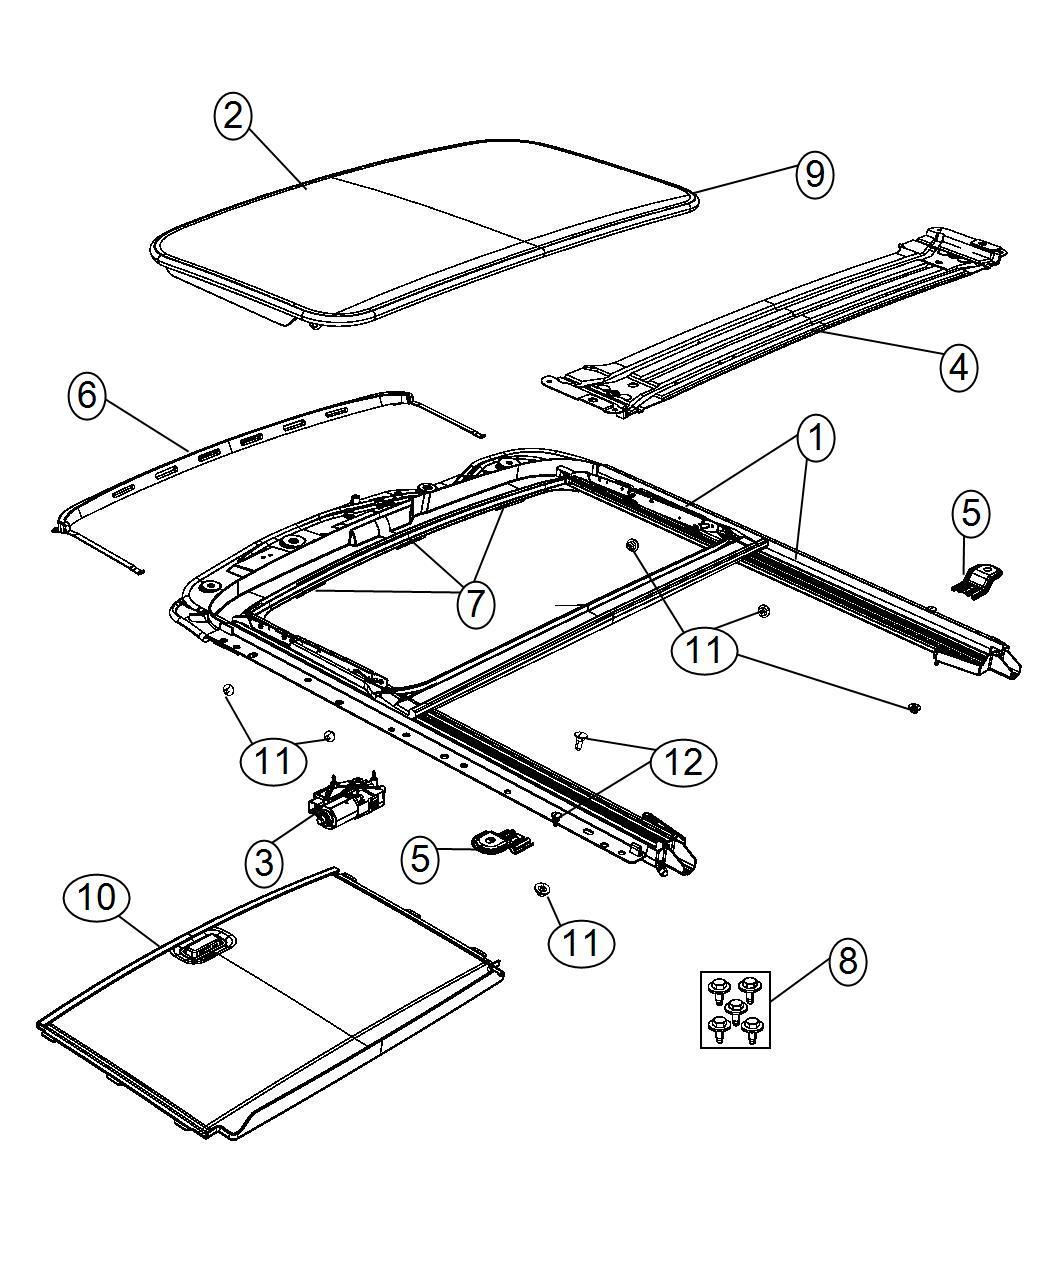 2008 Jeep Liberty Seal  Sunroof Glass  Trim   No Description Available